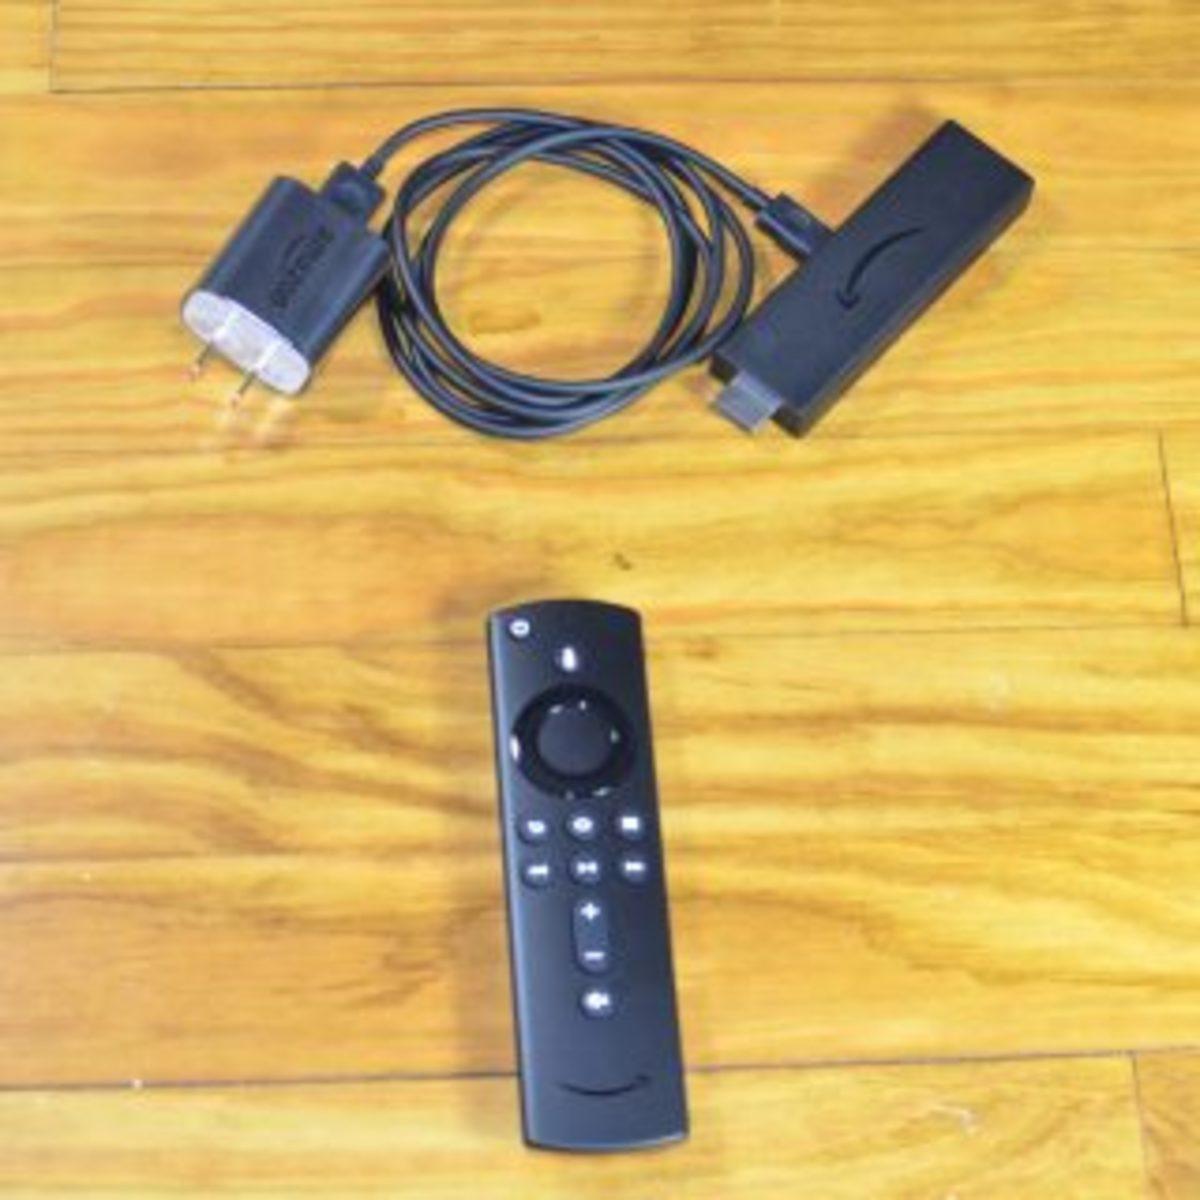 fire-tv-stick-cPanbo-e1543426957721-320x320